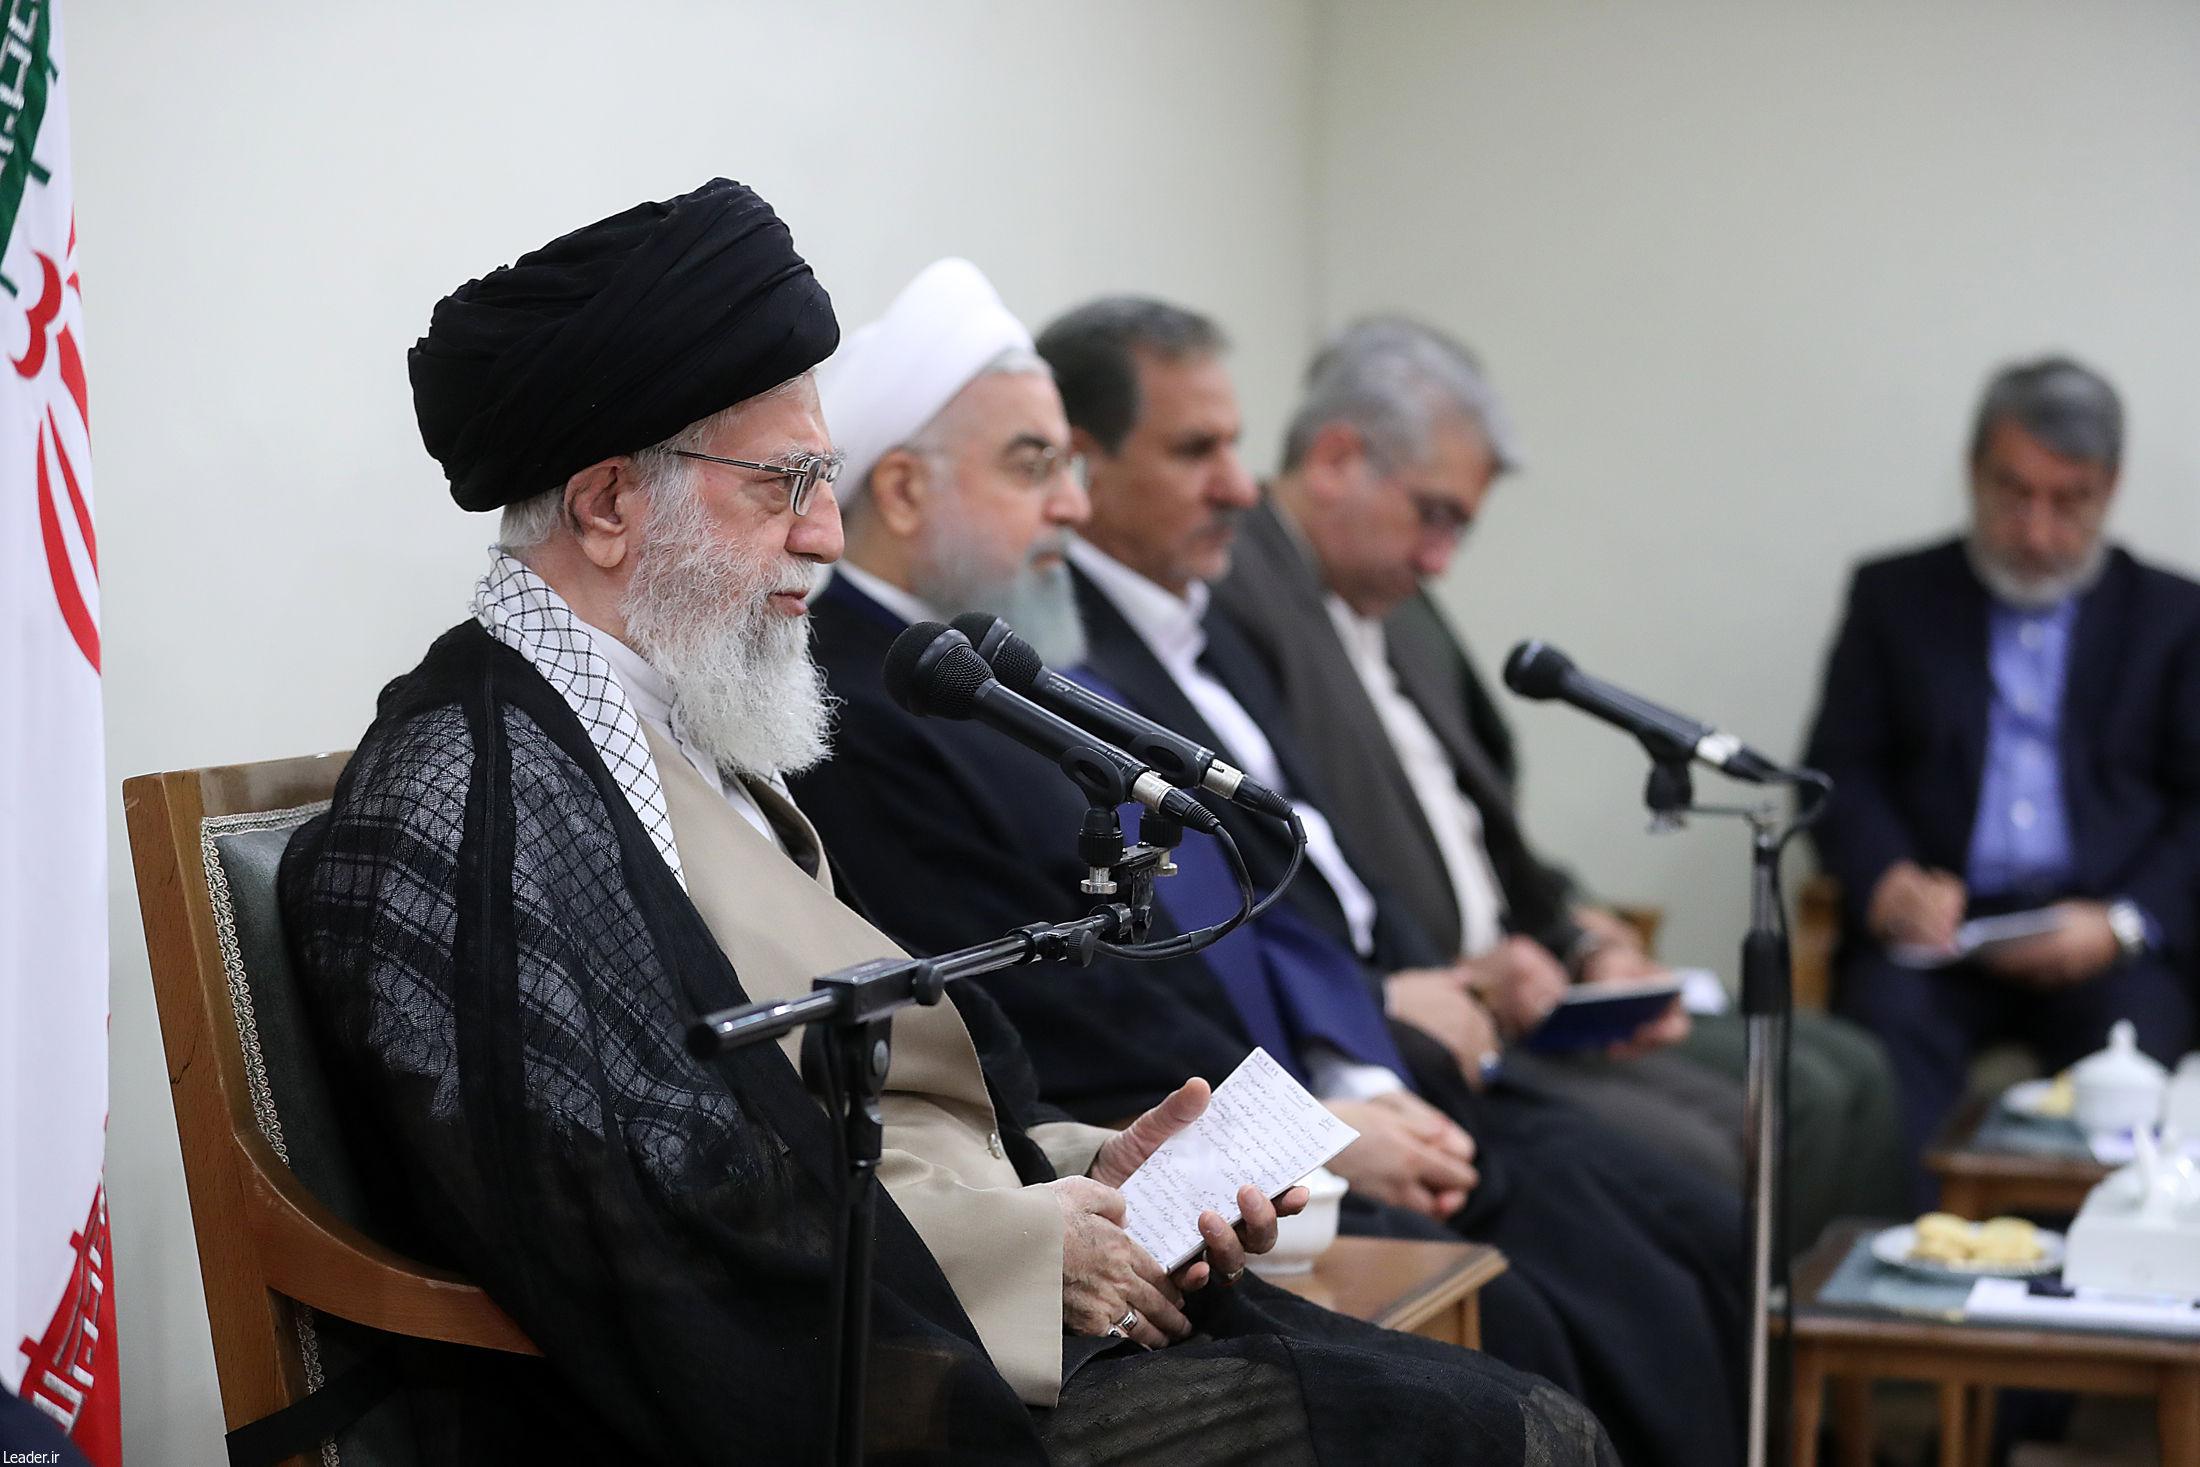 ⭕️ جلسه مهم رهبر انقلاب با اعضای دولت